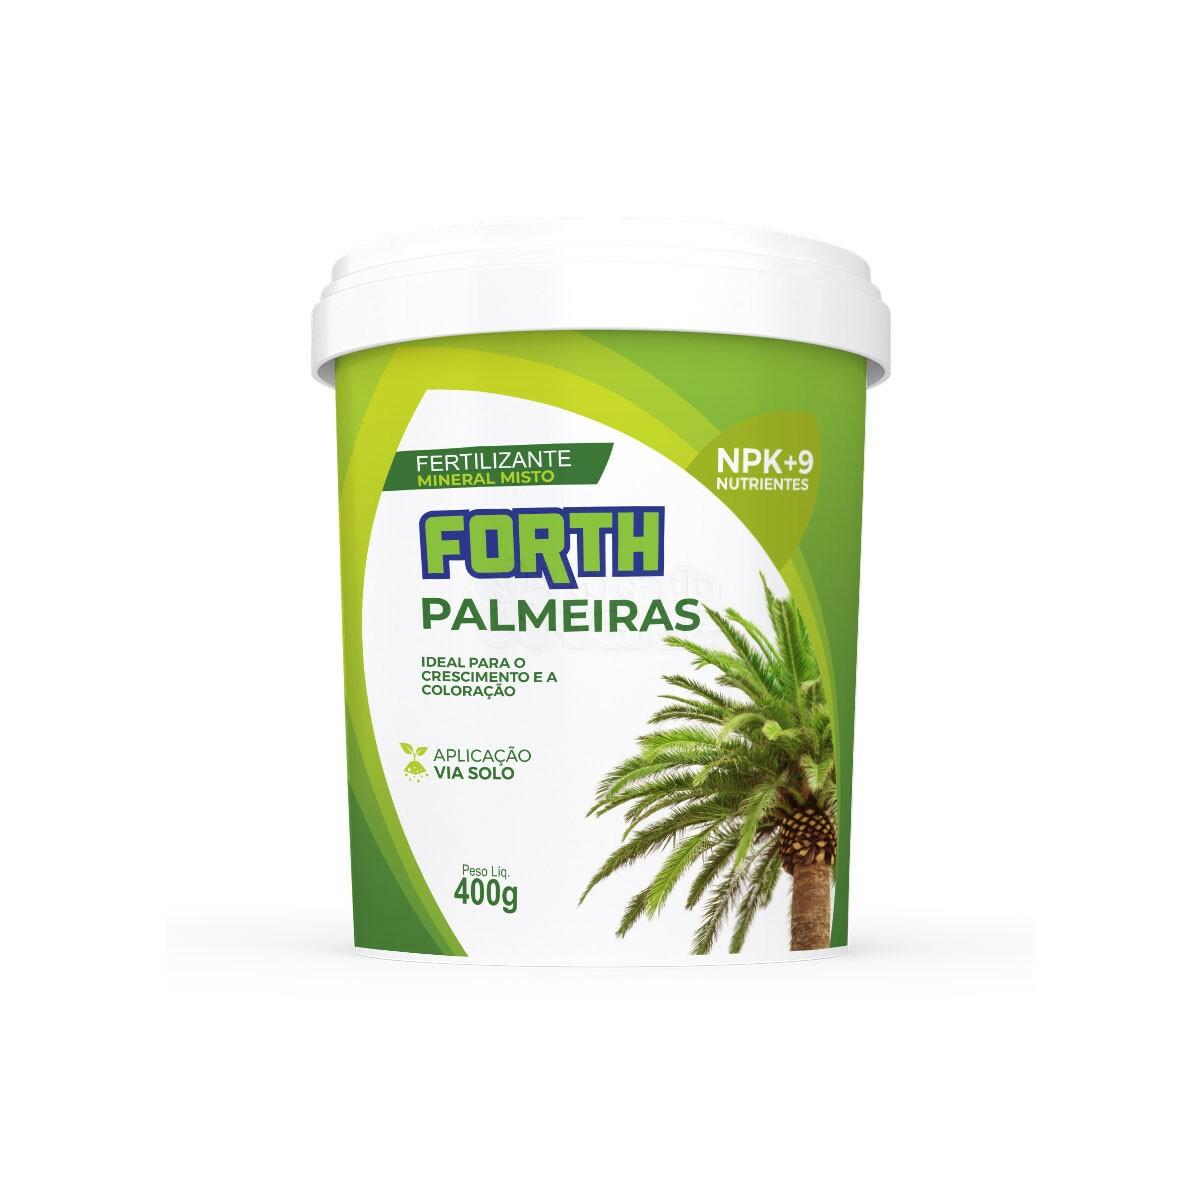 Forth Palmeiras - Fertilizante - 400g (Fertilizantes)